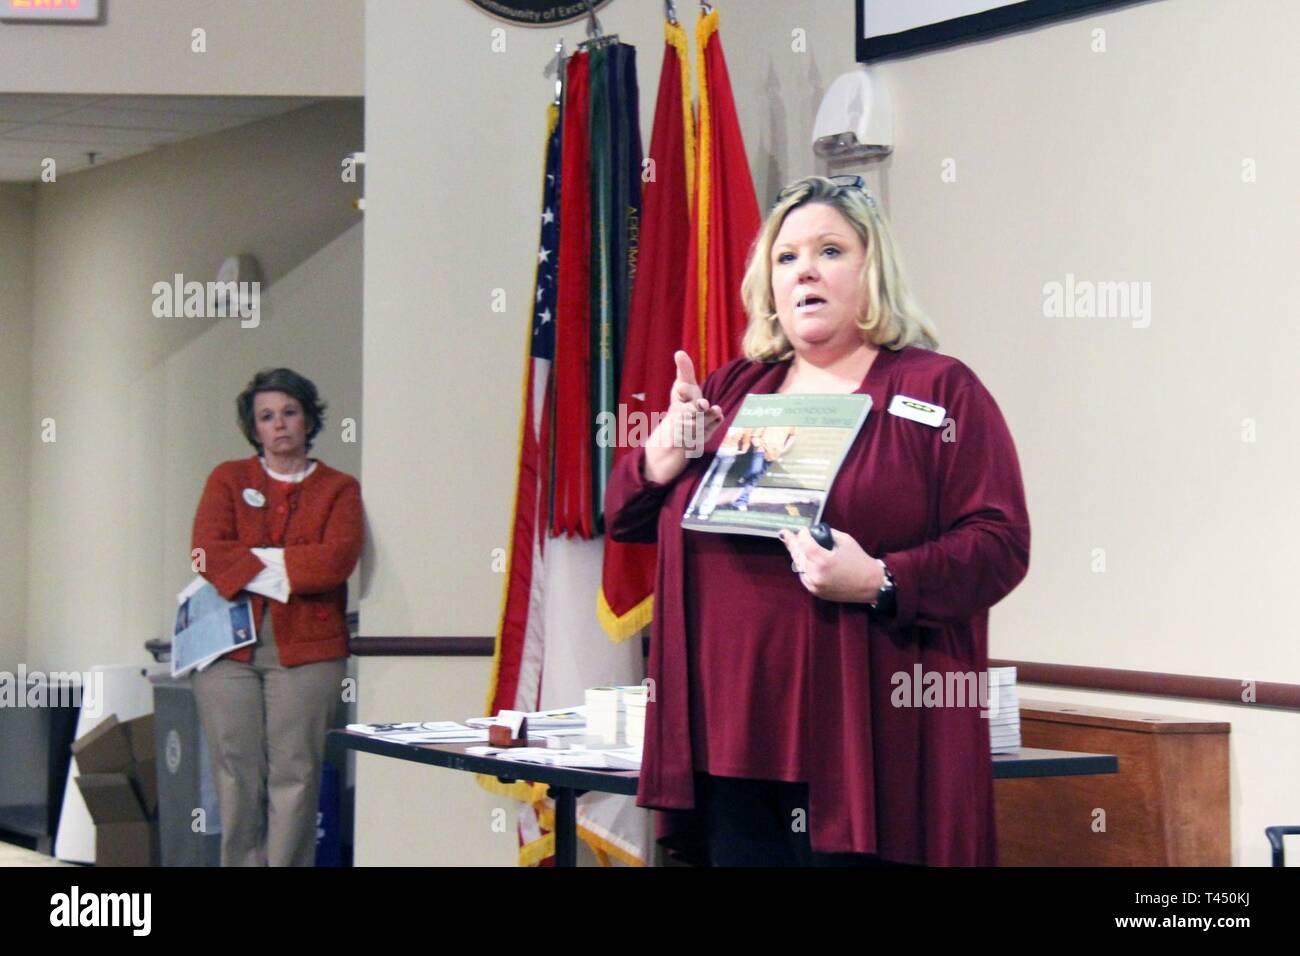 Family Advocacy Program Stock Photos & Family Advocacy